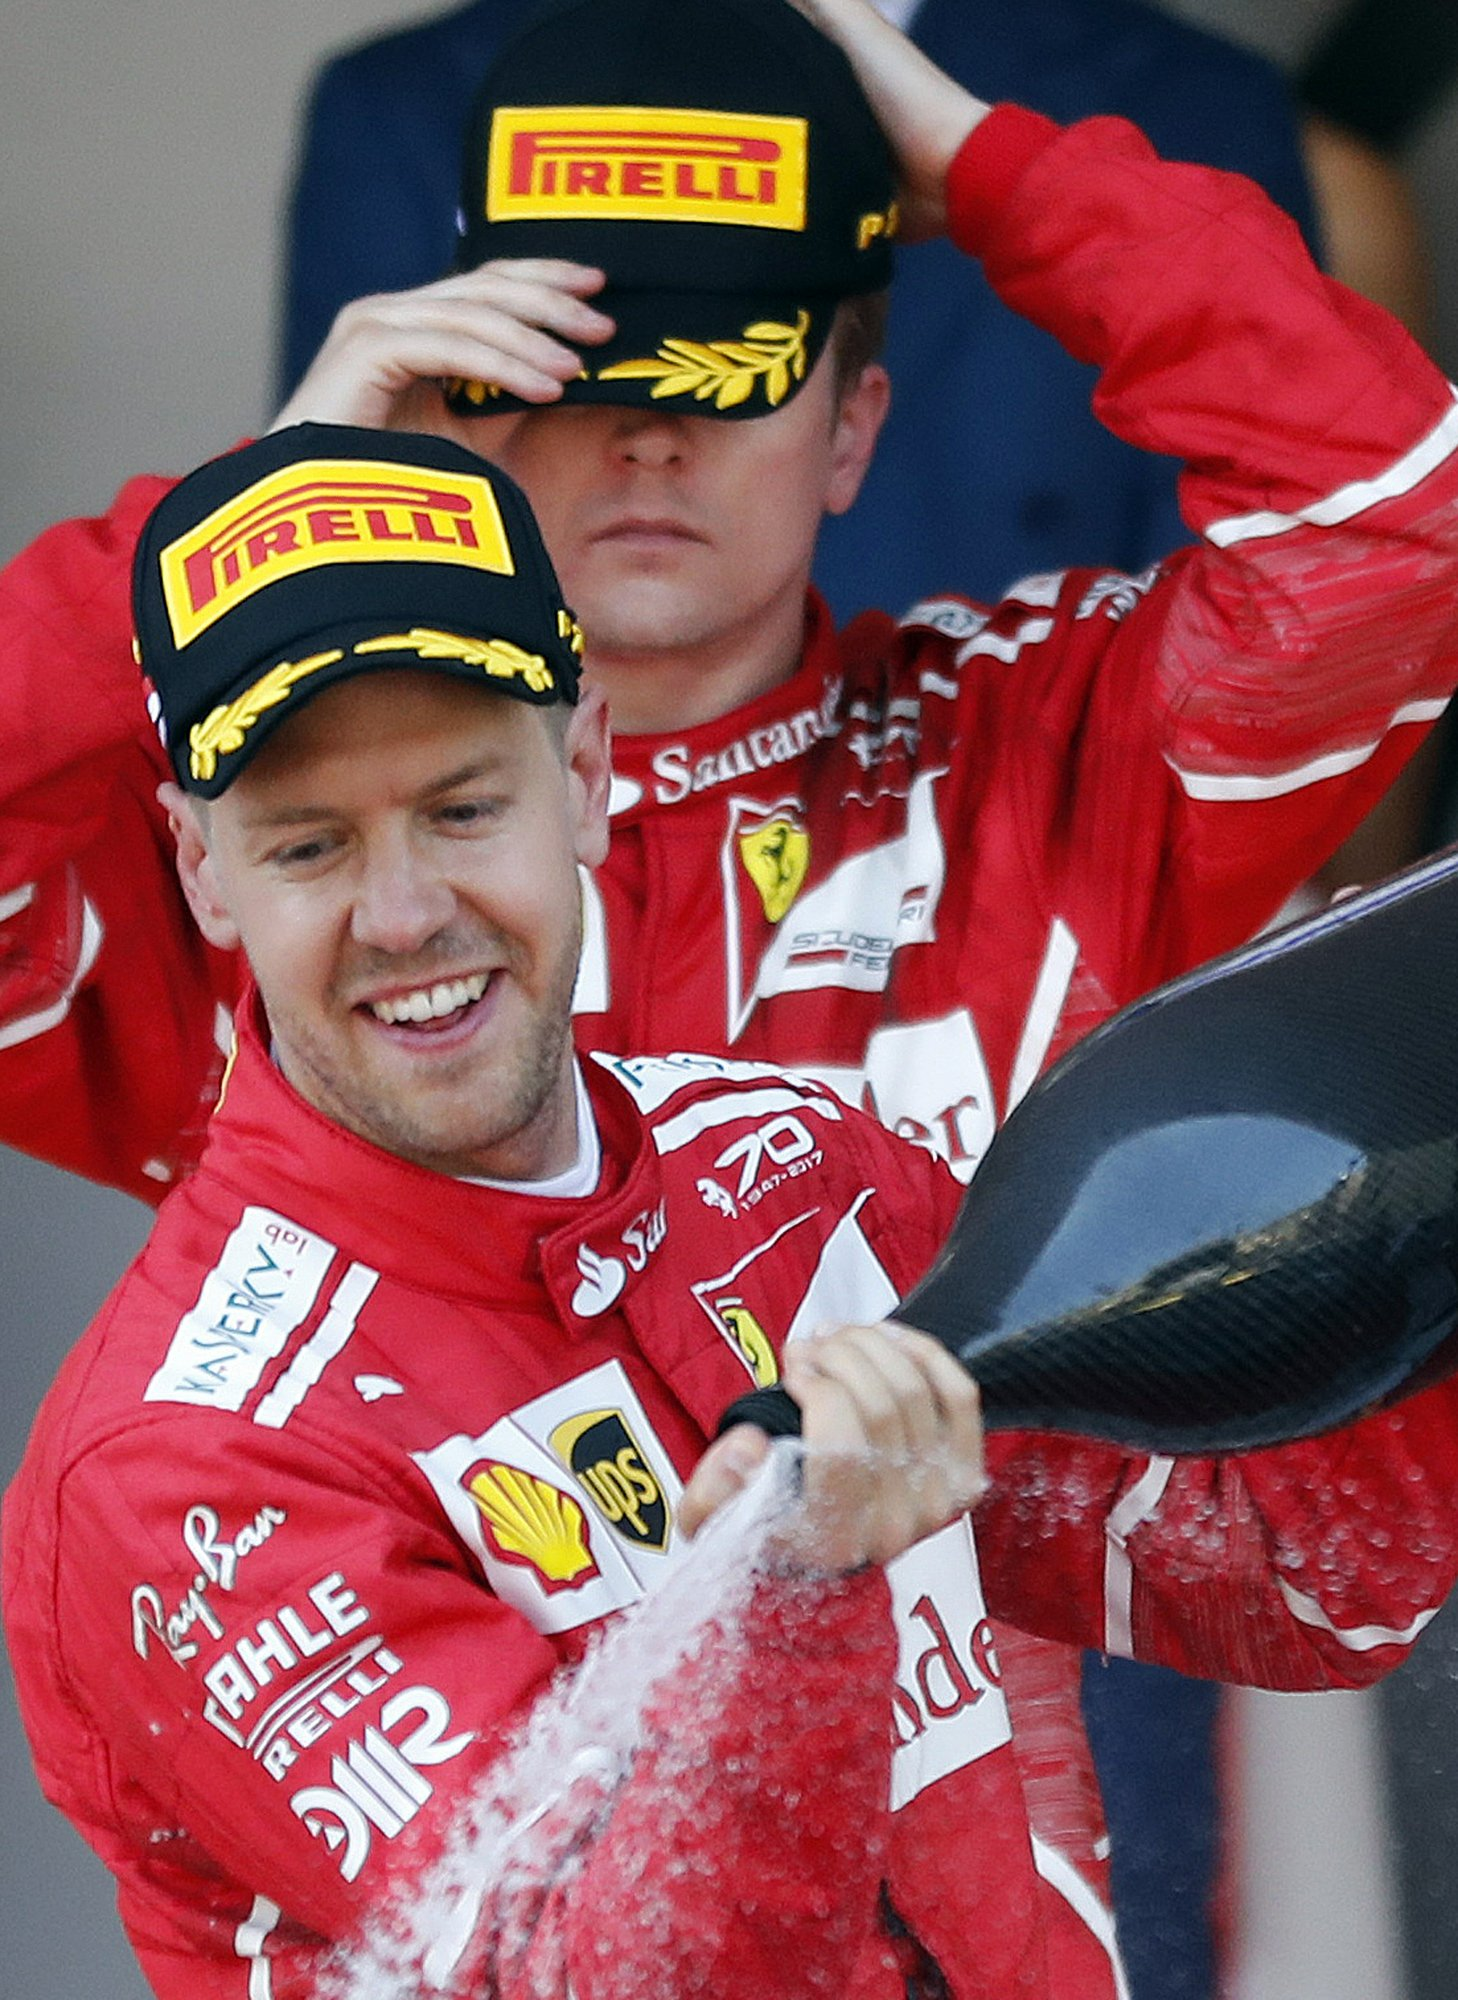 b74c92e0c0 Not all smiles at Ferrari as Raikkonen unhappy with team